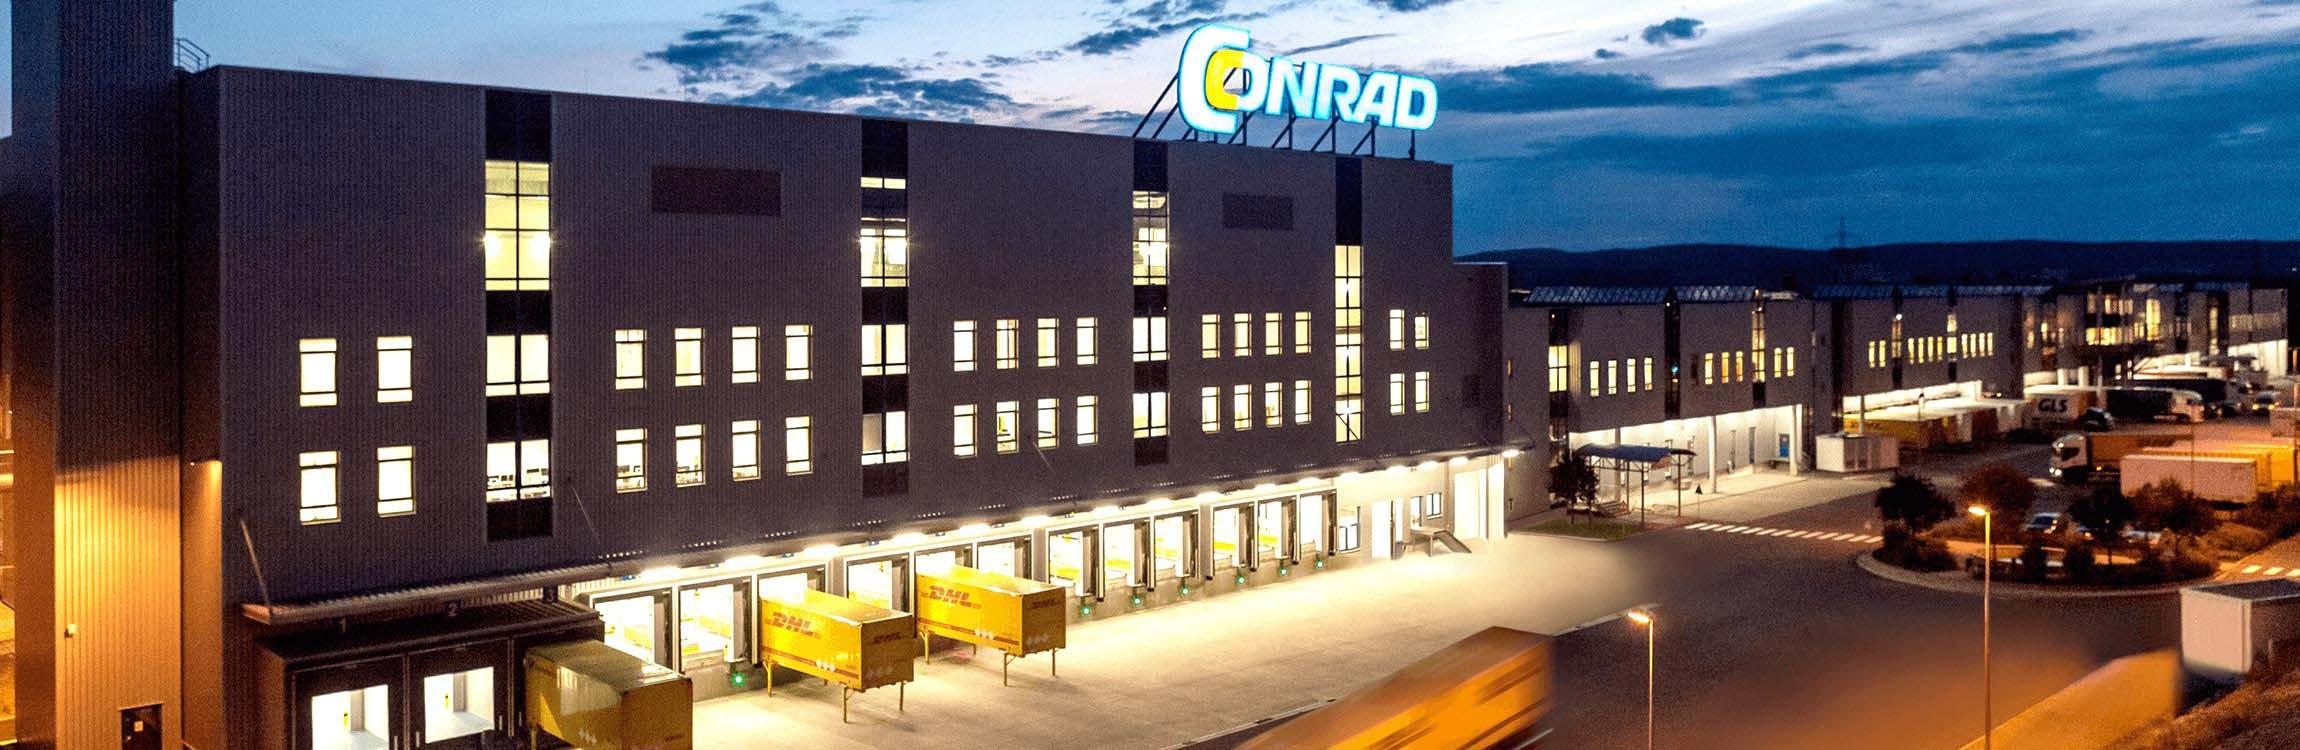 The new distribution center for Conrad.